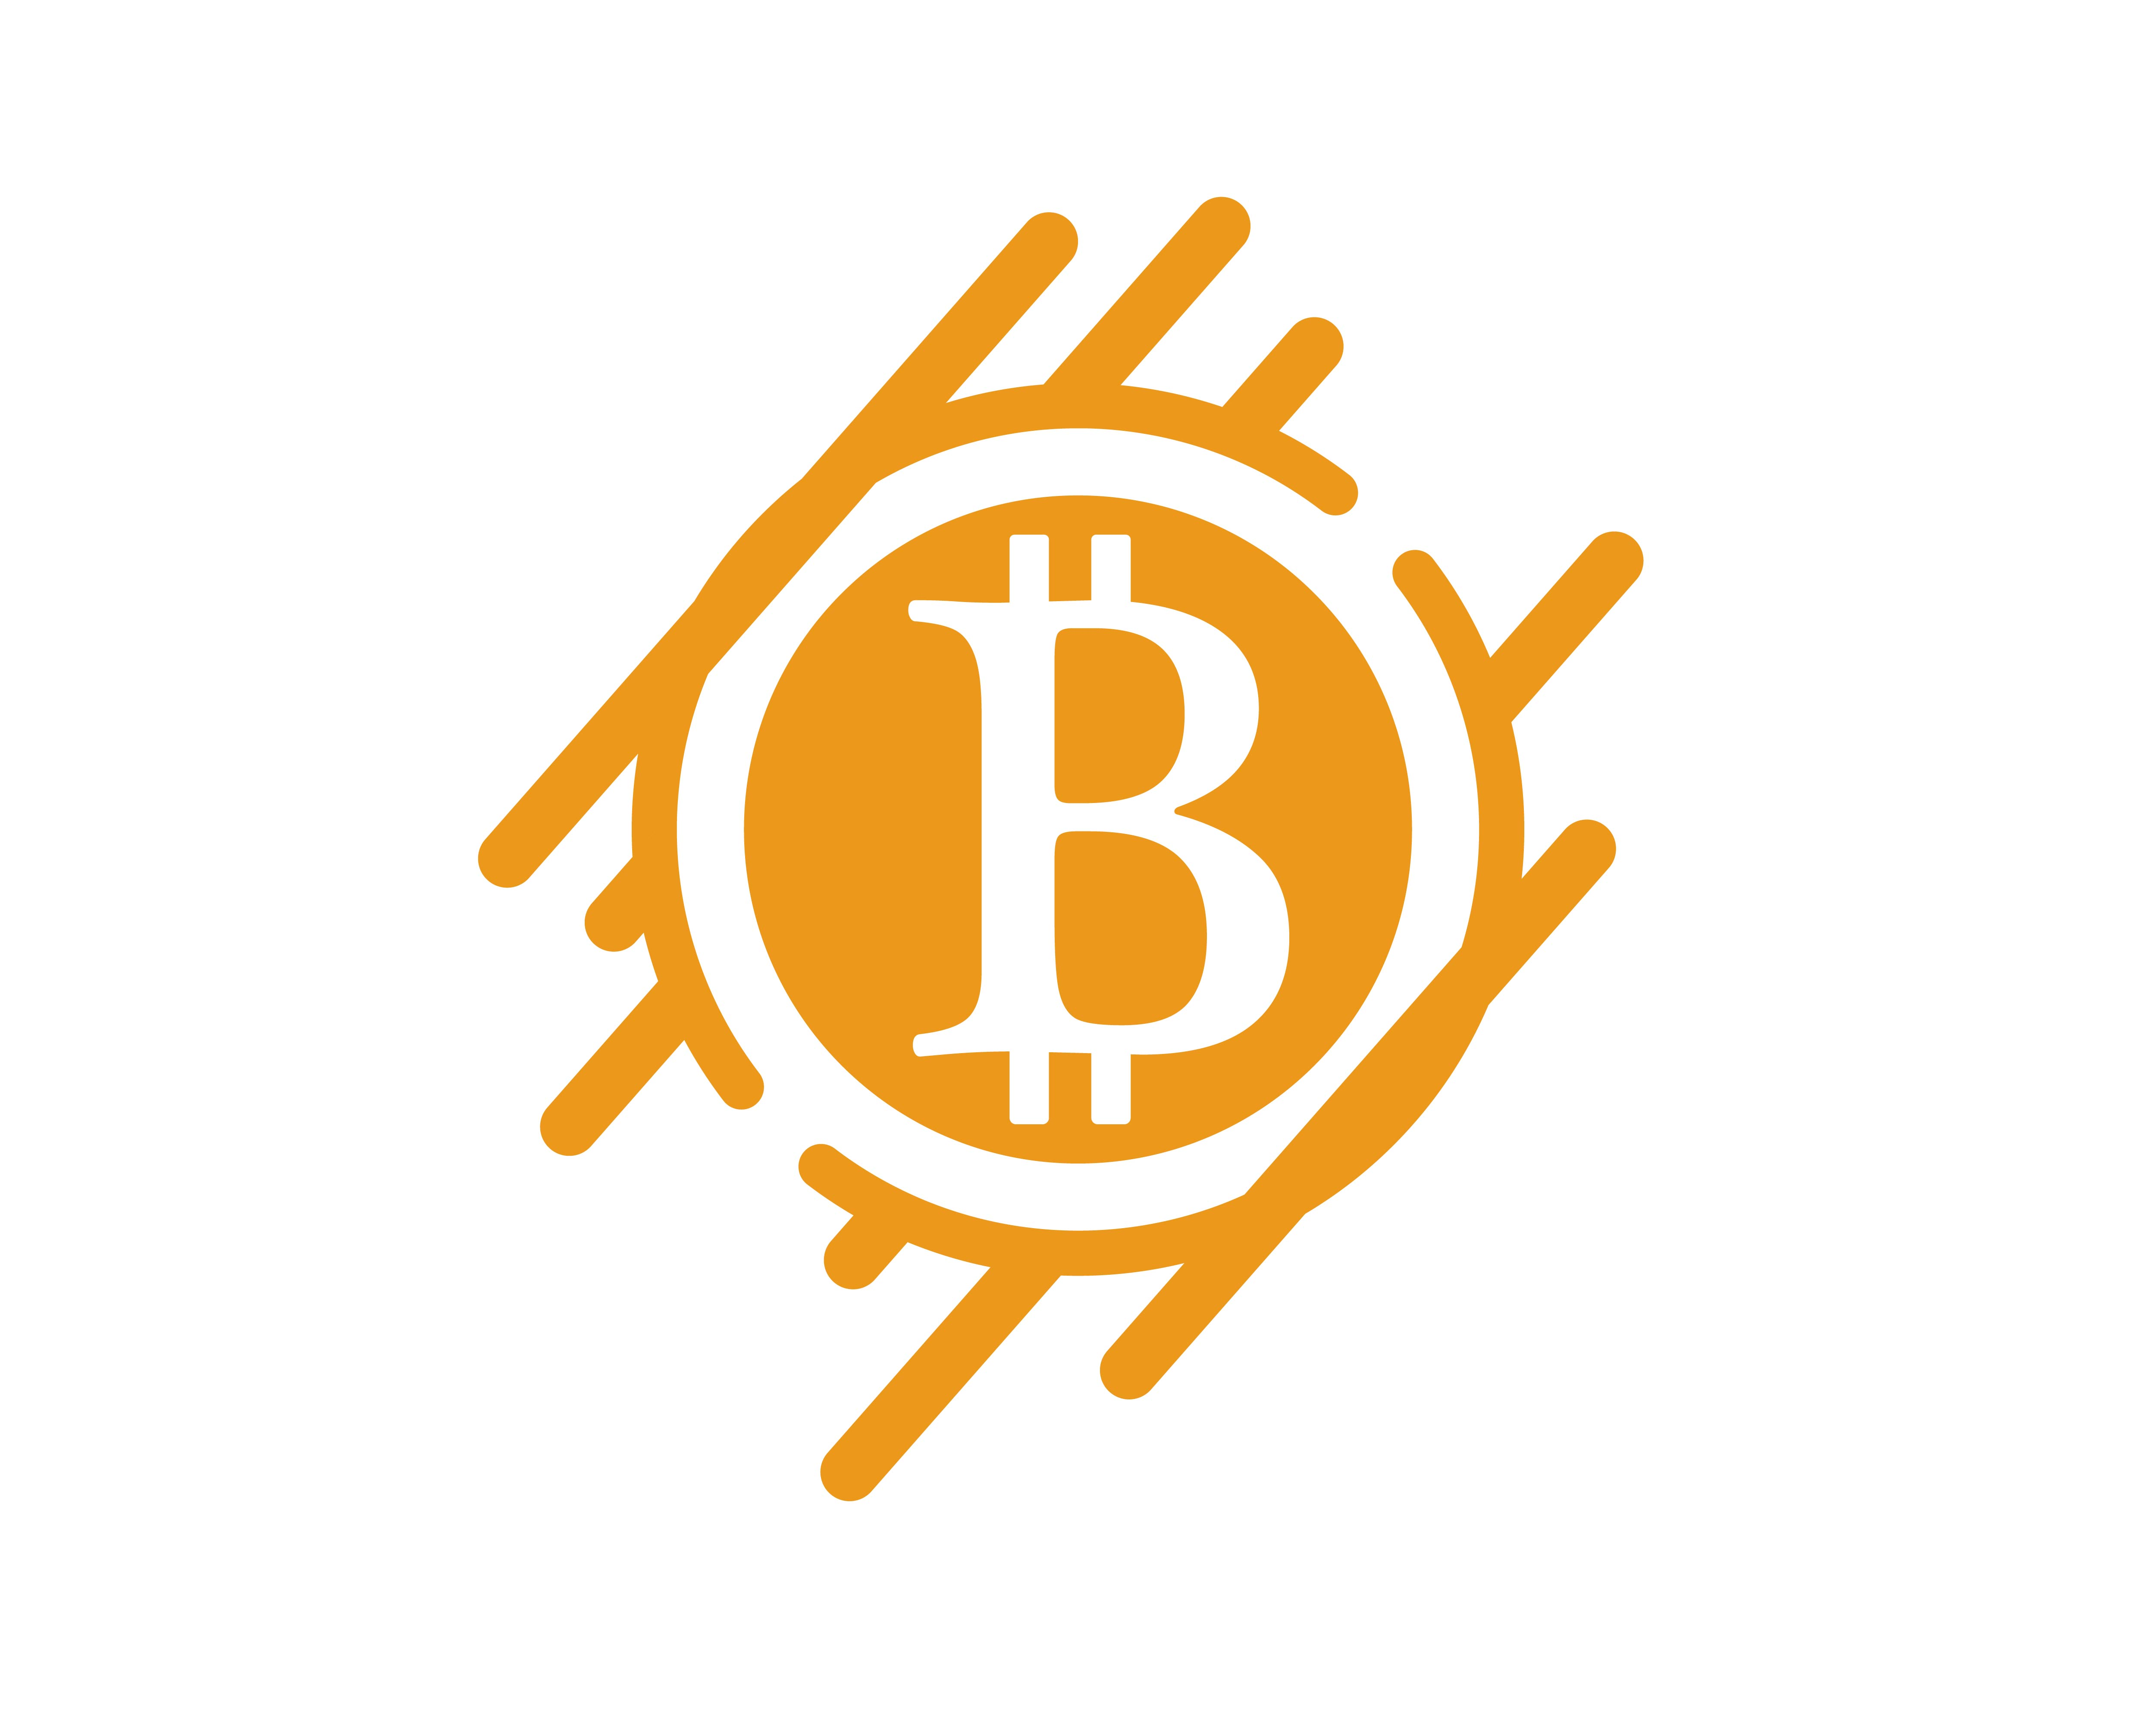 Bitcoin logo vector template - Download Free Vectors ...